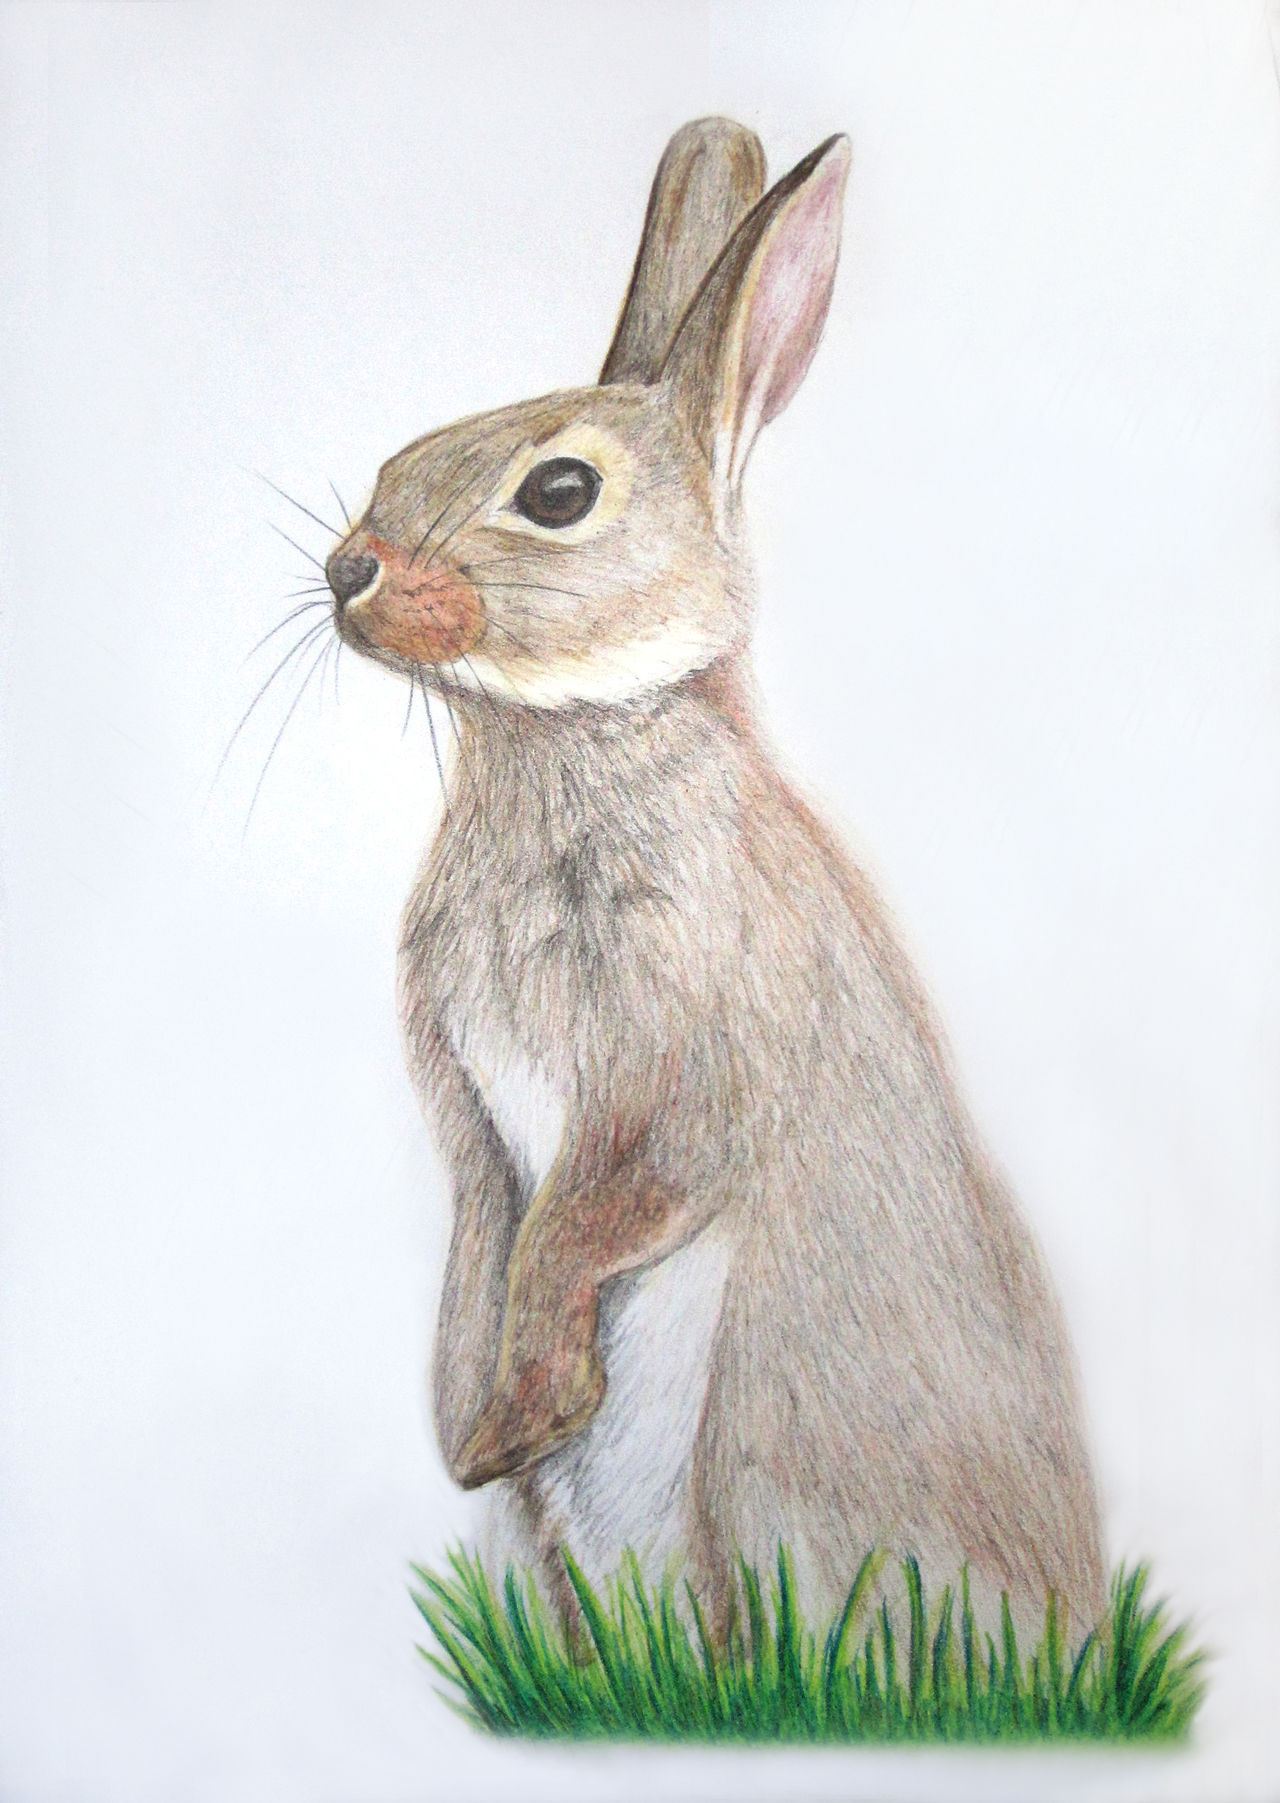 Rabbit colour pencil drawing Animal Art Animal Themes Art Art And Craft Art, Drawing, Creativity Artist Artistic Arts Culture And Entertainment ArtWork Bunny  Bunny 🐰 Draw Drawing Drawing ✏ Drawings Drawingtime Fluffy Nature Pets Rabbit Rabbit Artwork Rabbit ❤️ Rabbit 🐇 Rabbits Rabbits 🐇